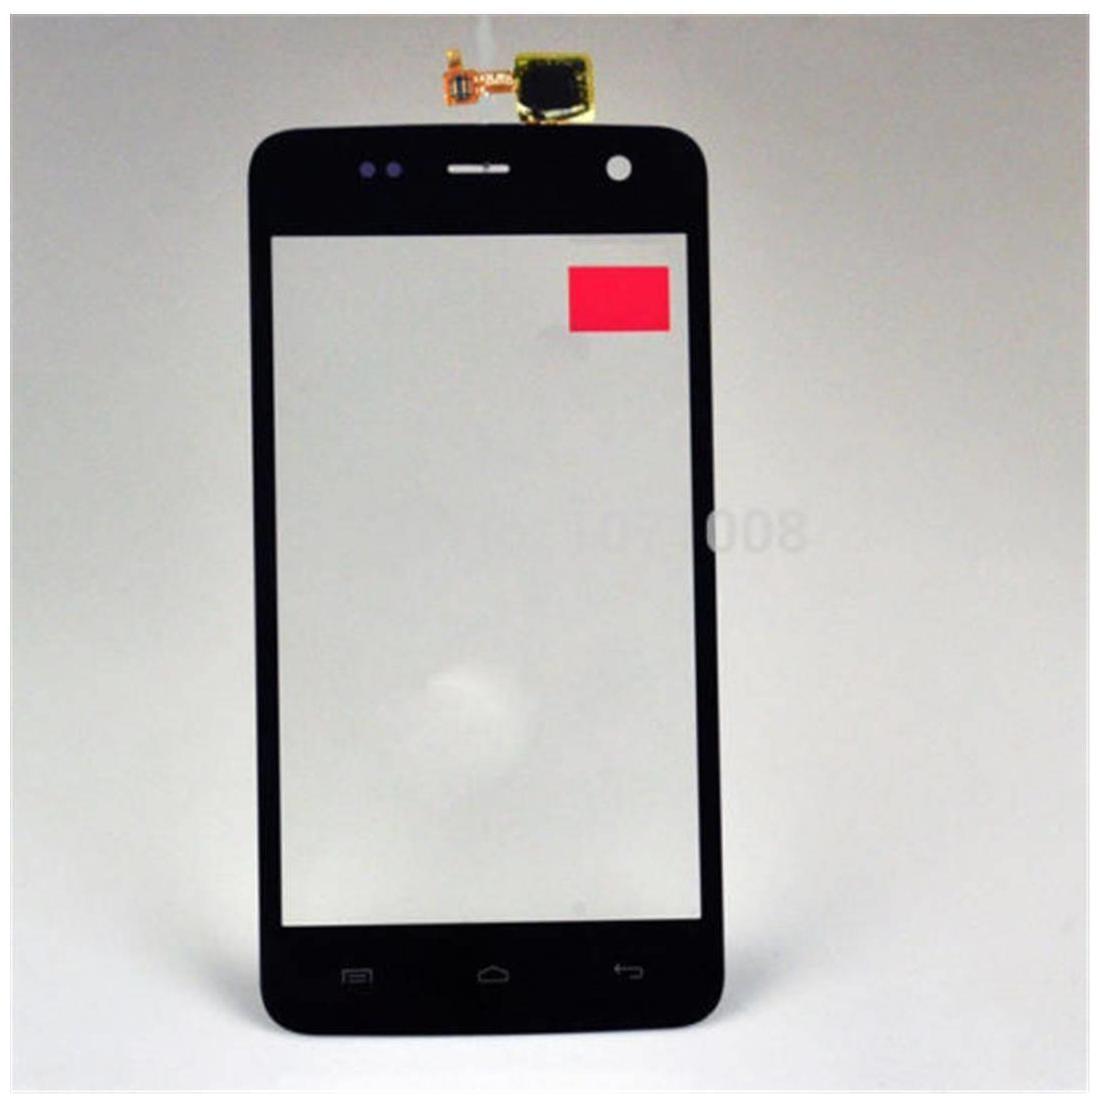 Premium Touch Screen Digitizer Glass for Micromax Unite 2 A106